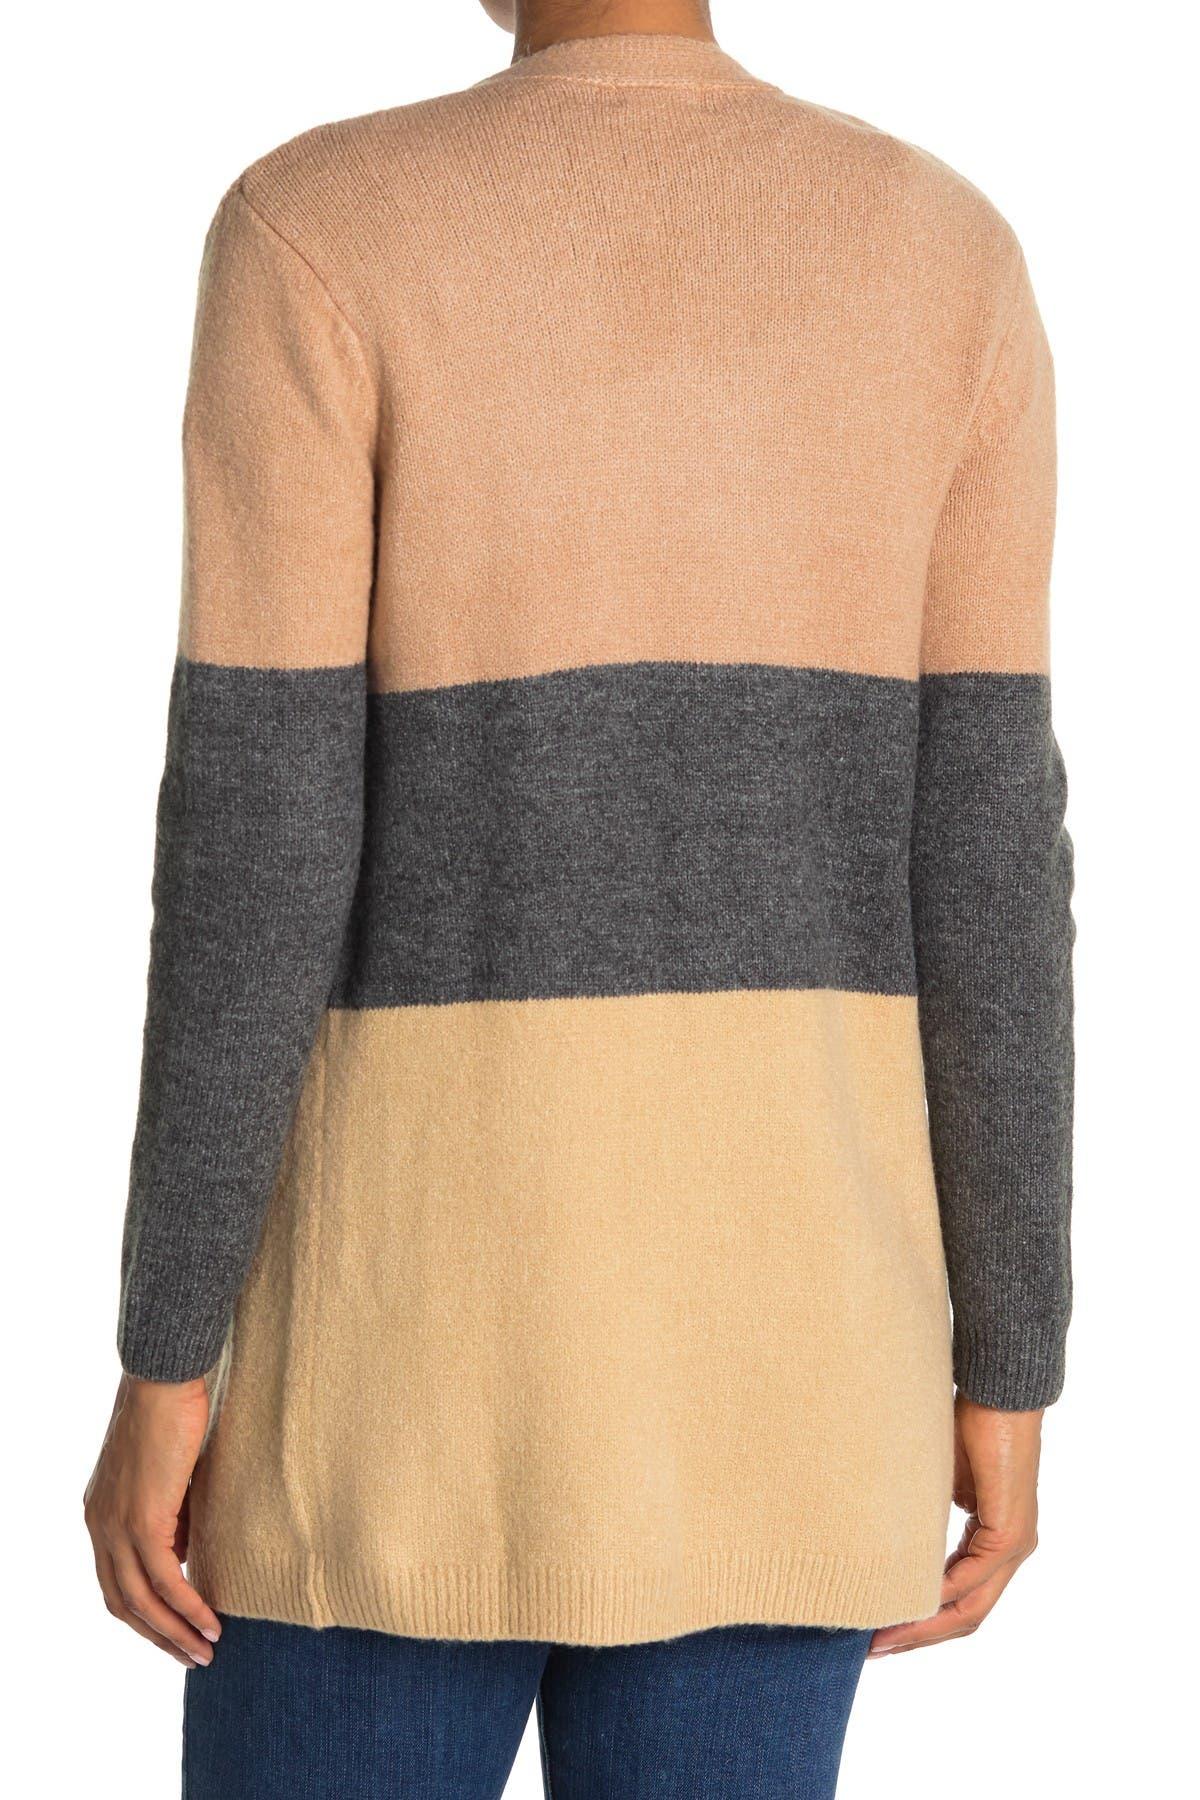 Image of Ceny Colorblock Cardigan Sweater